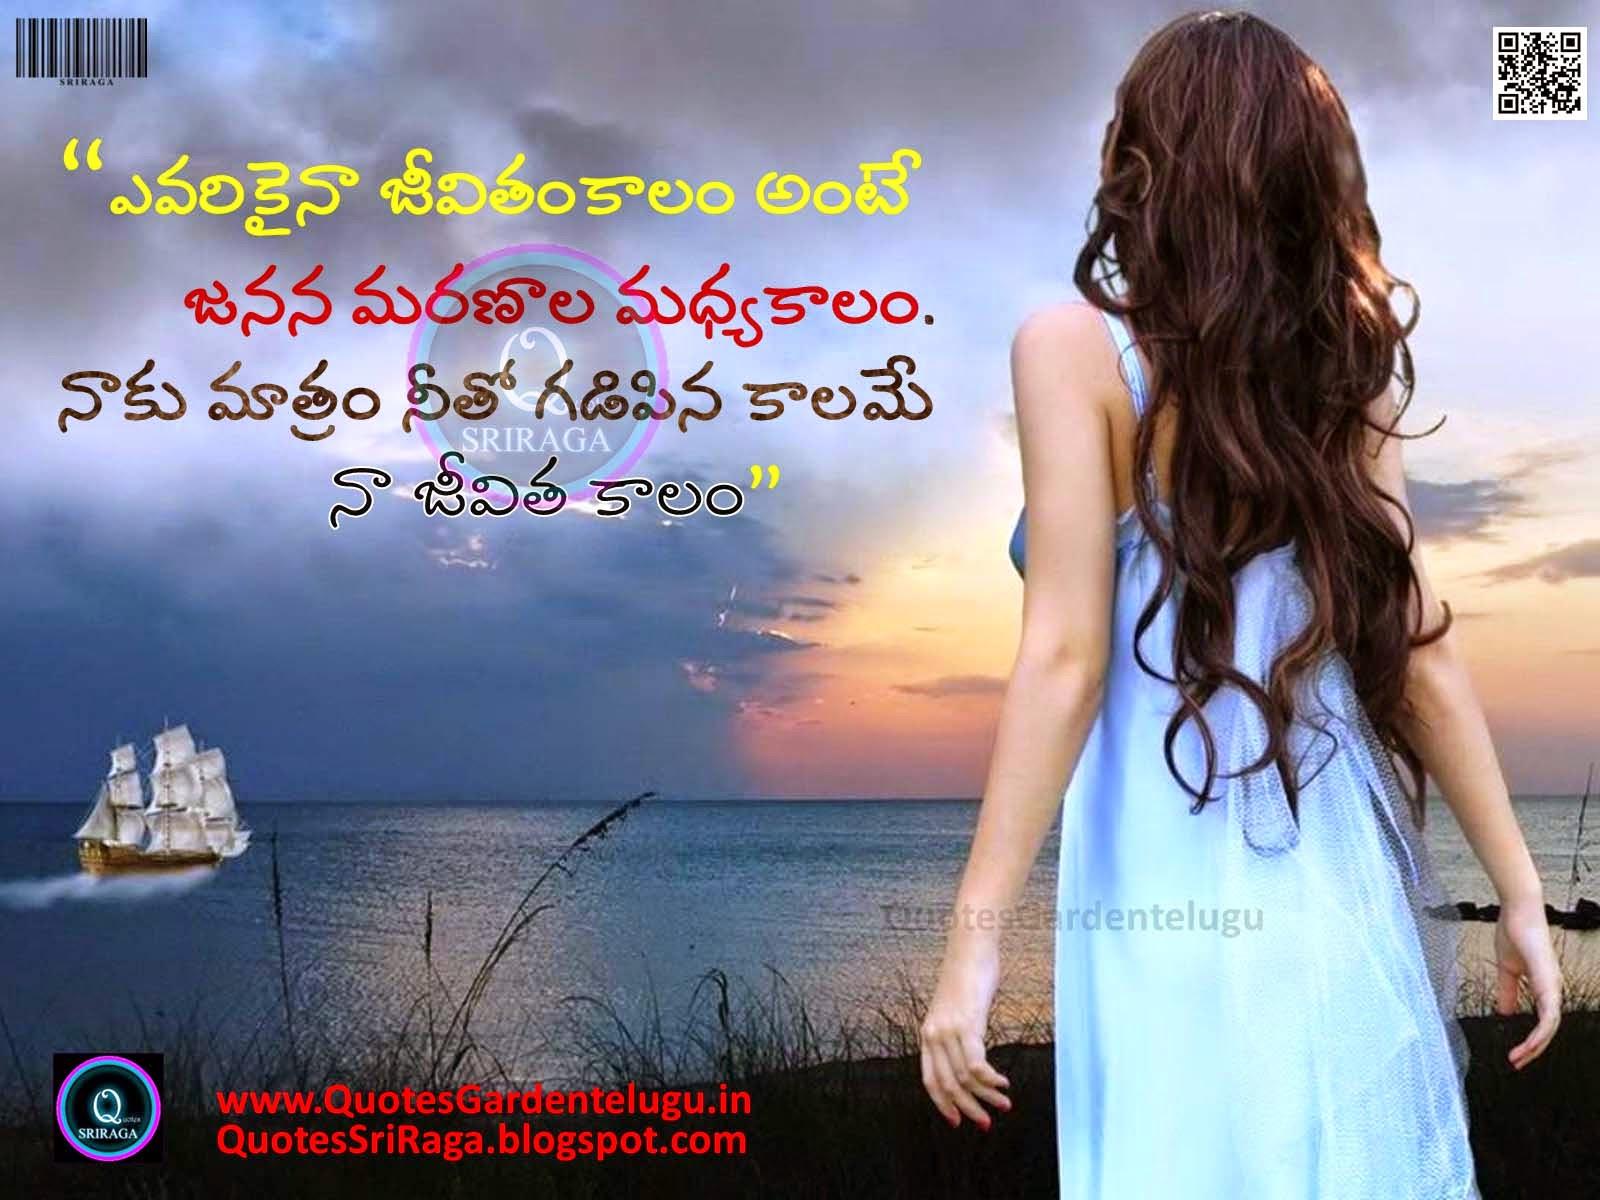 40 Best Love Failure Quotes Images In 2019 Love Failure - Love Quotes Telugu Lo - HD Wallpaper